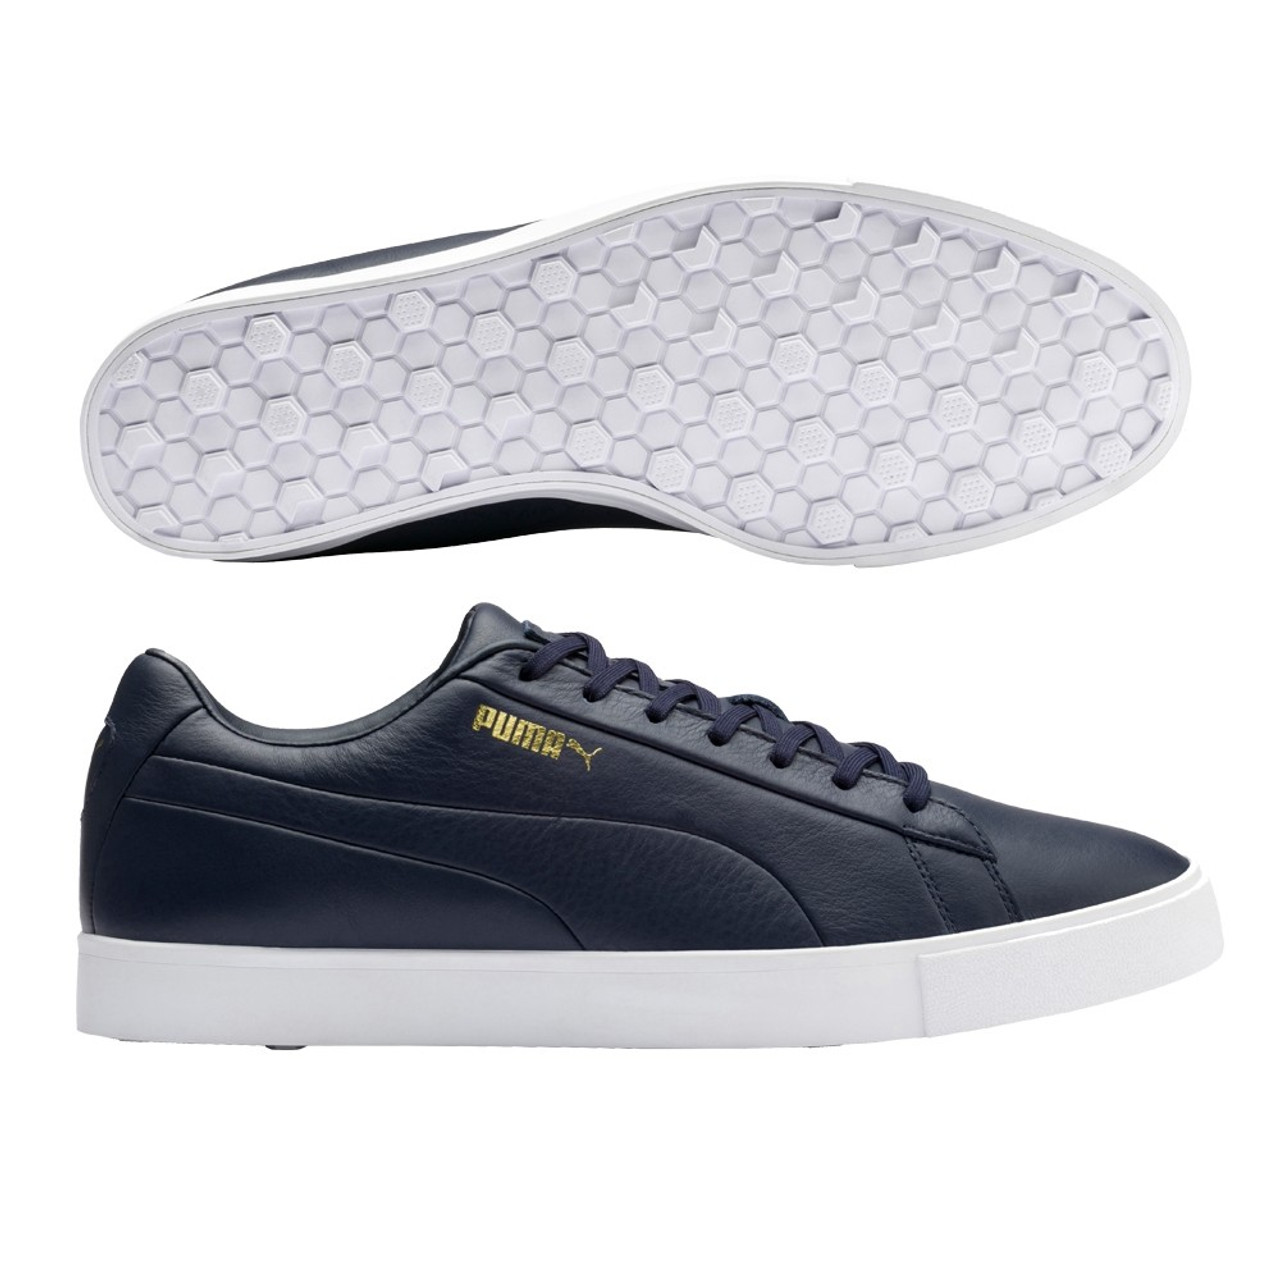 Puma Original G Golf Shoes - Peacoat